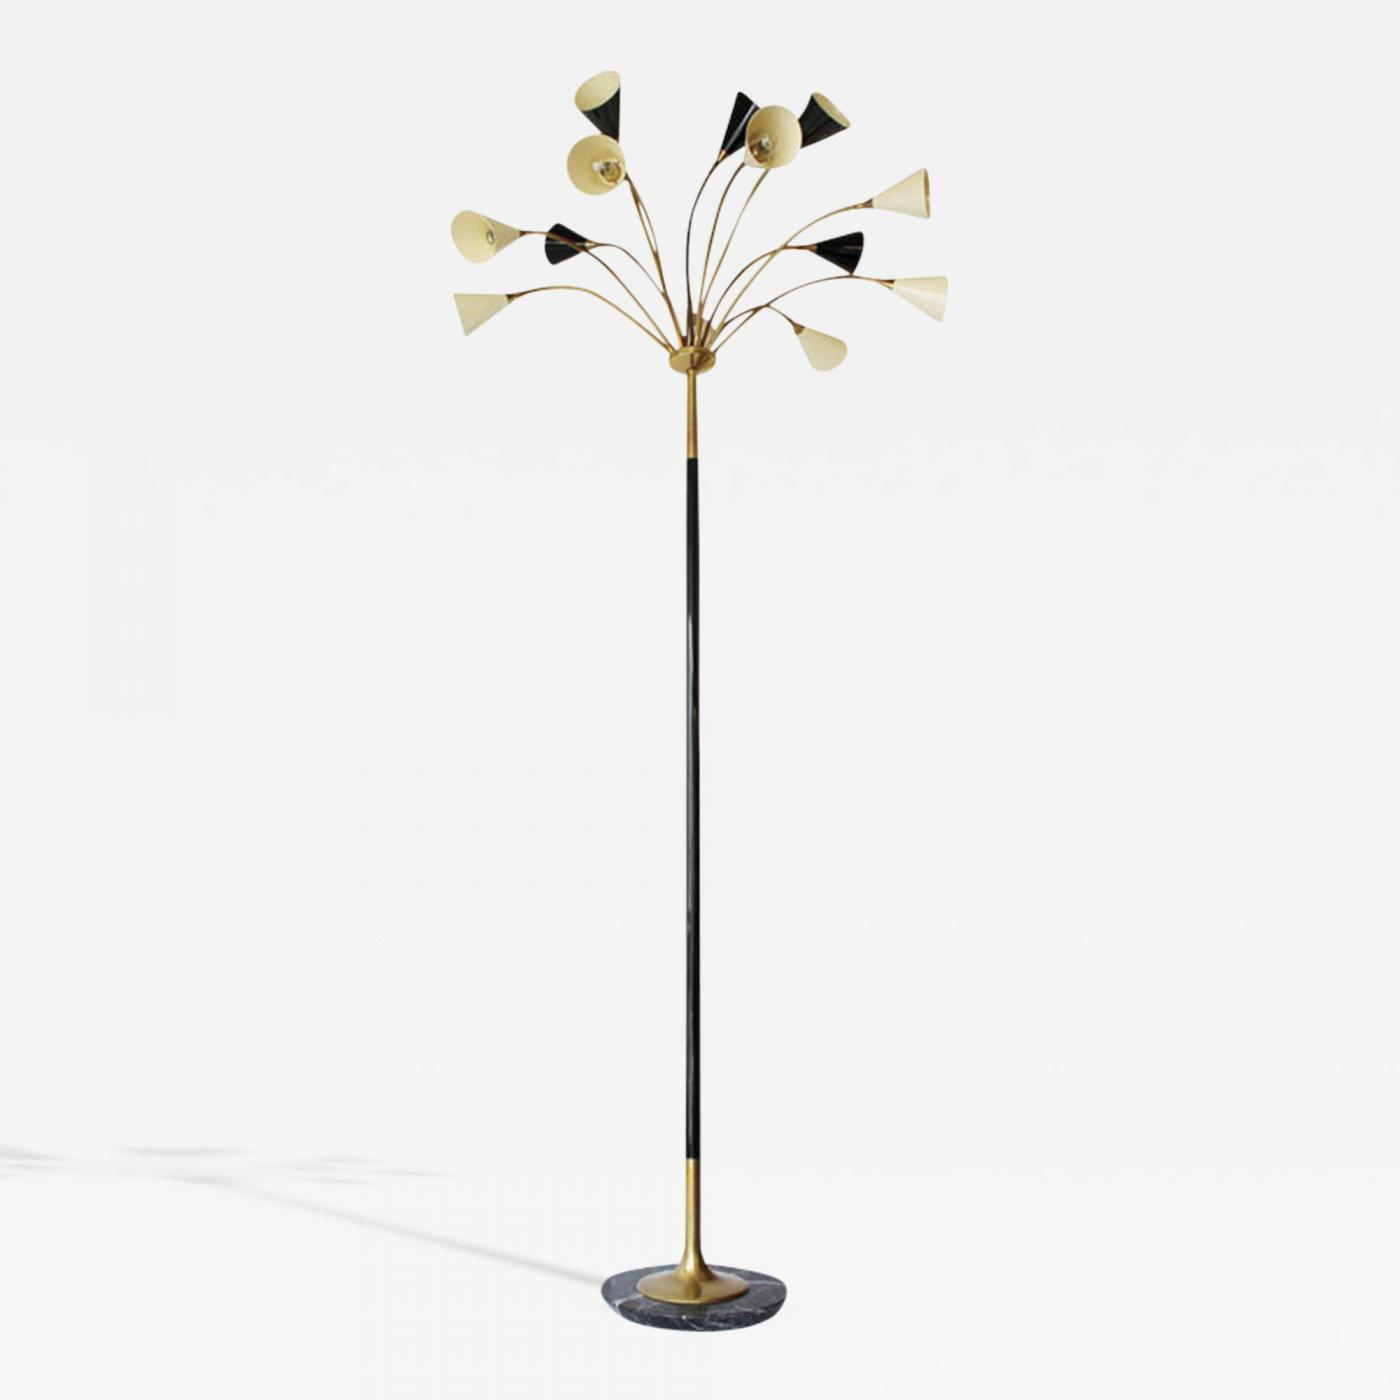 Lotus flower floor lamp free aluminum flower vase floor lamp perfect listings furniture lighting floor lamps with lotus flower floor lamp izmirmasajfo